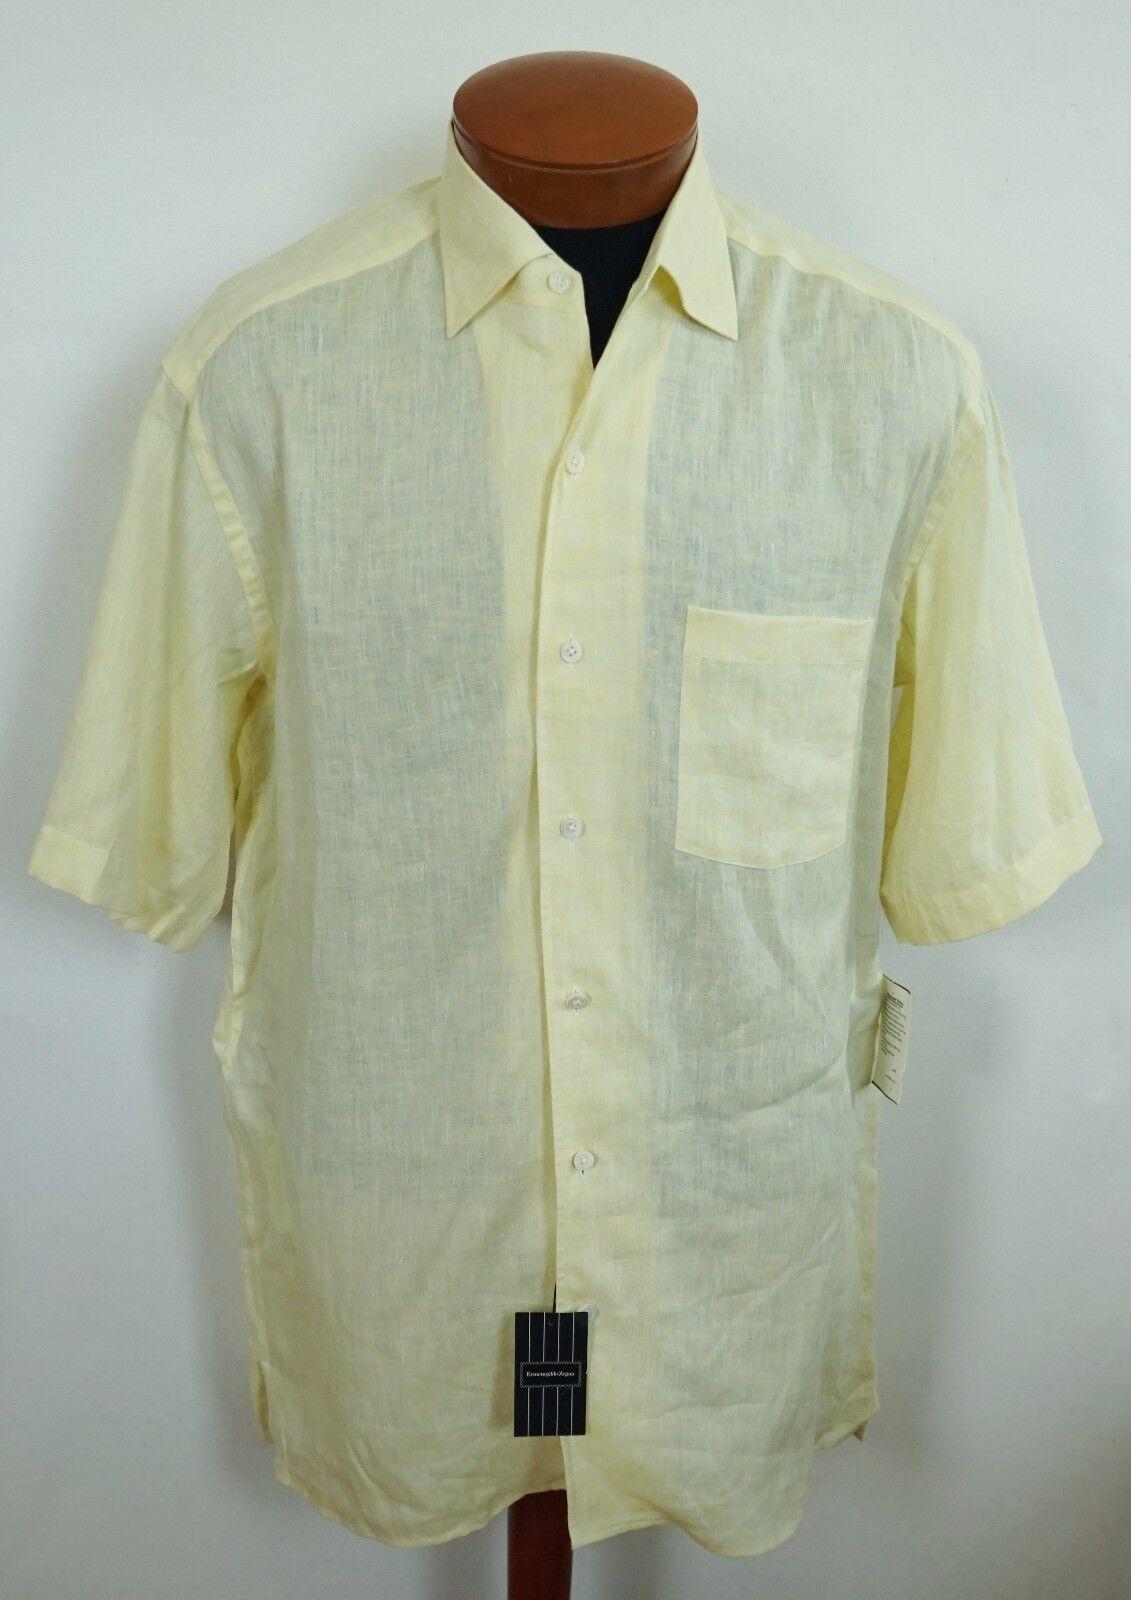 NWT Authentic ERMENEGILDO ZEGNA Yellow 100% LINEN Short Sleeve Shirt M